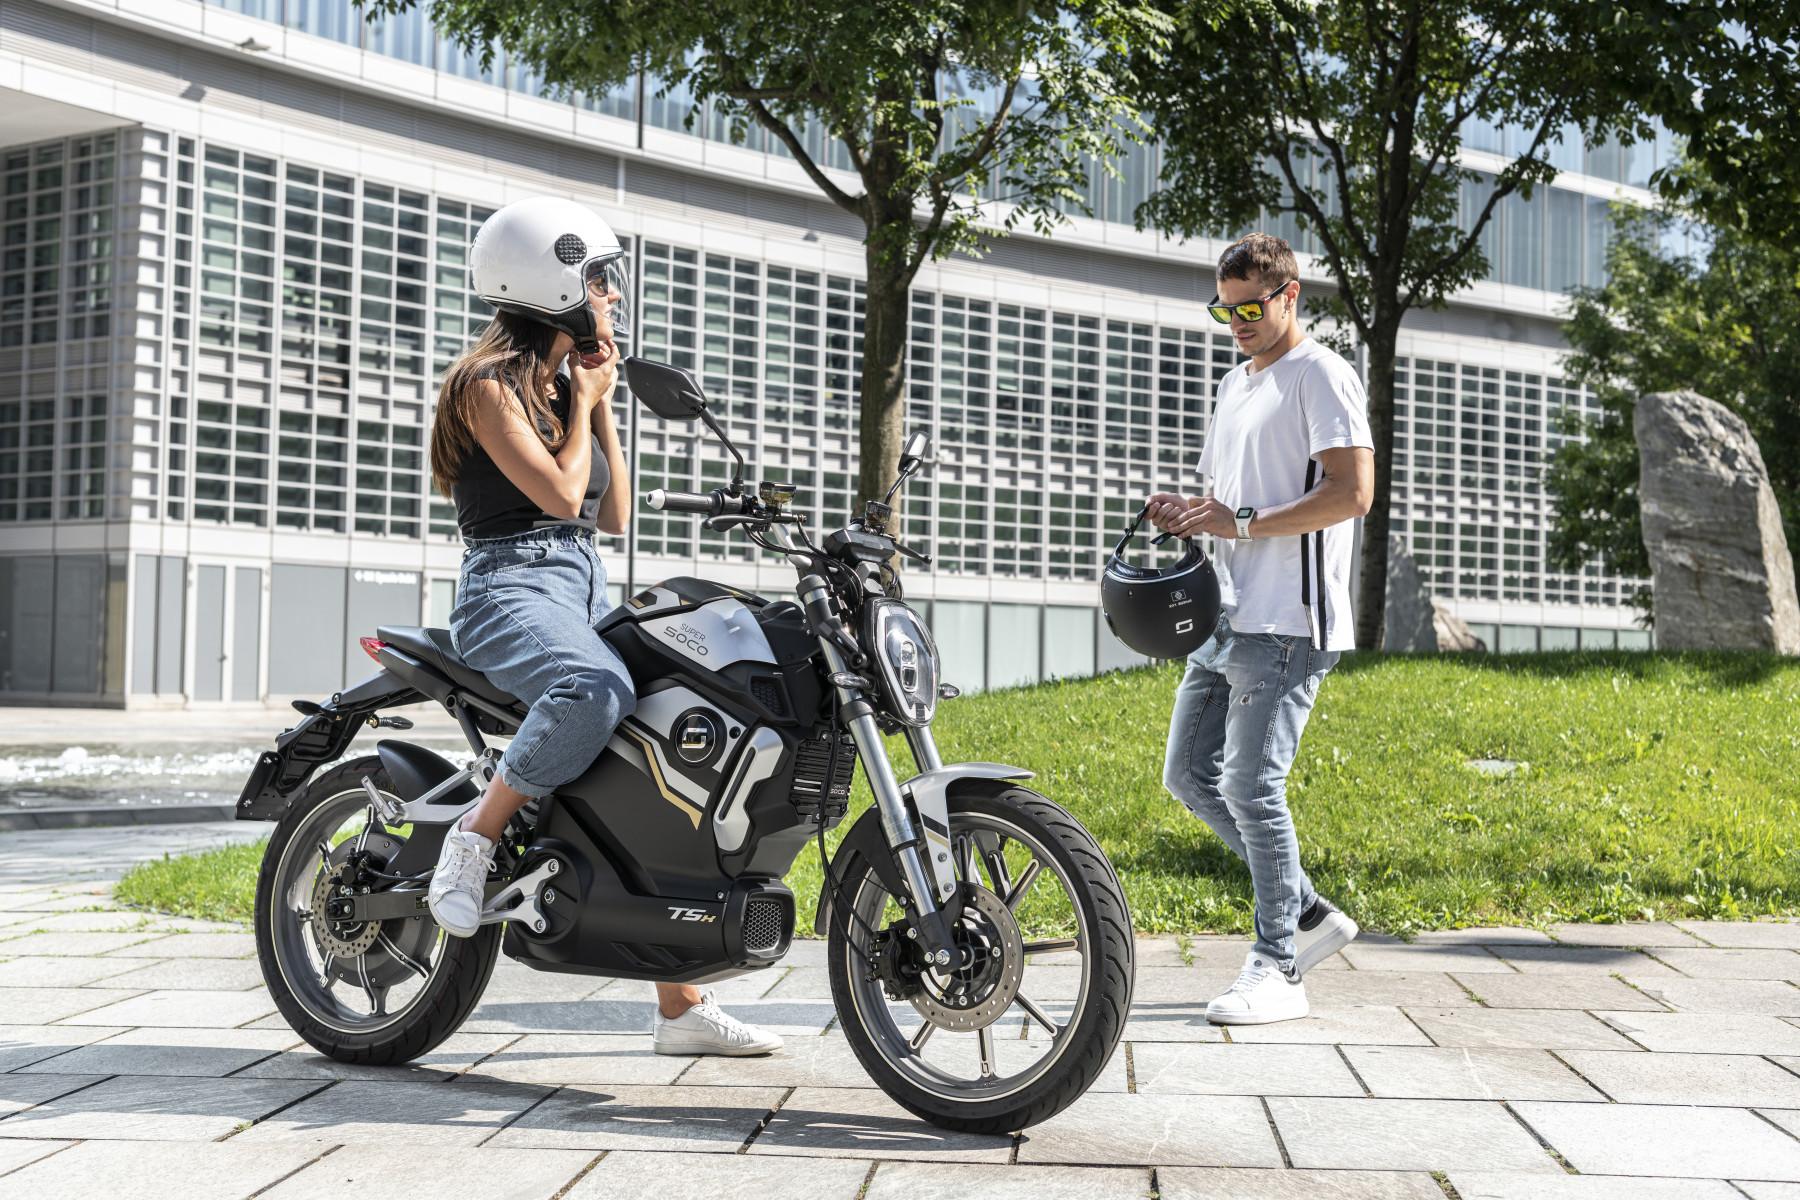 Super Soco TSx electric motorcycle lifestyle image